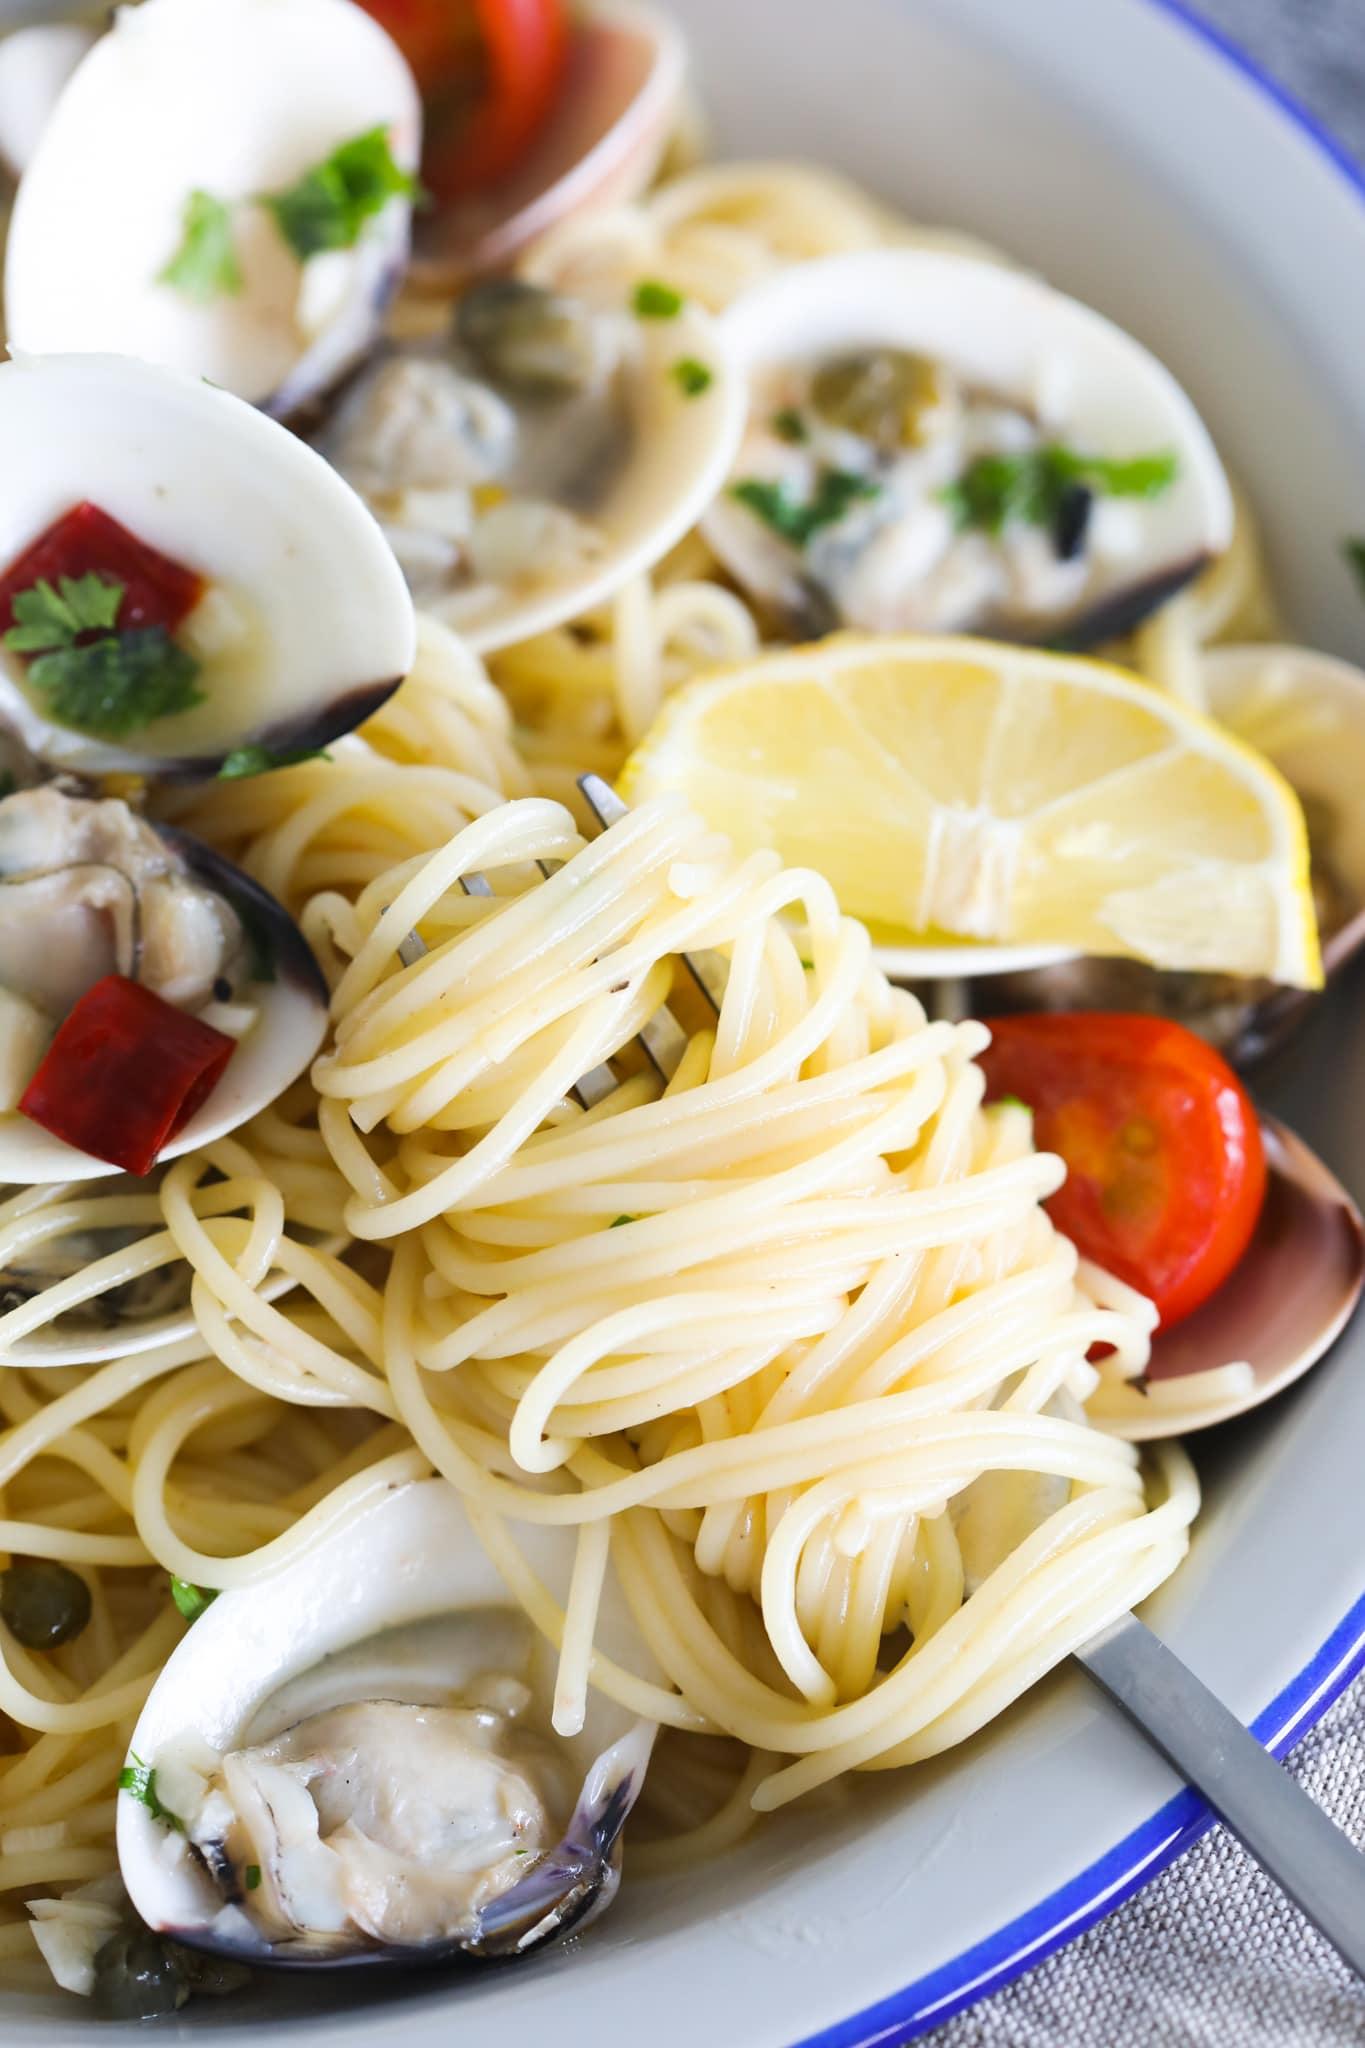 Capellini recipe with simple ingredients.